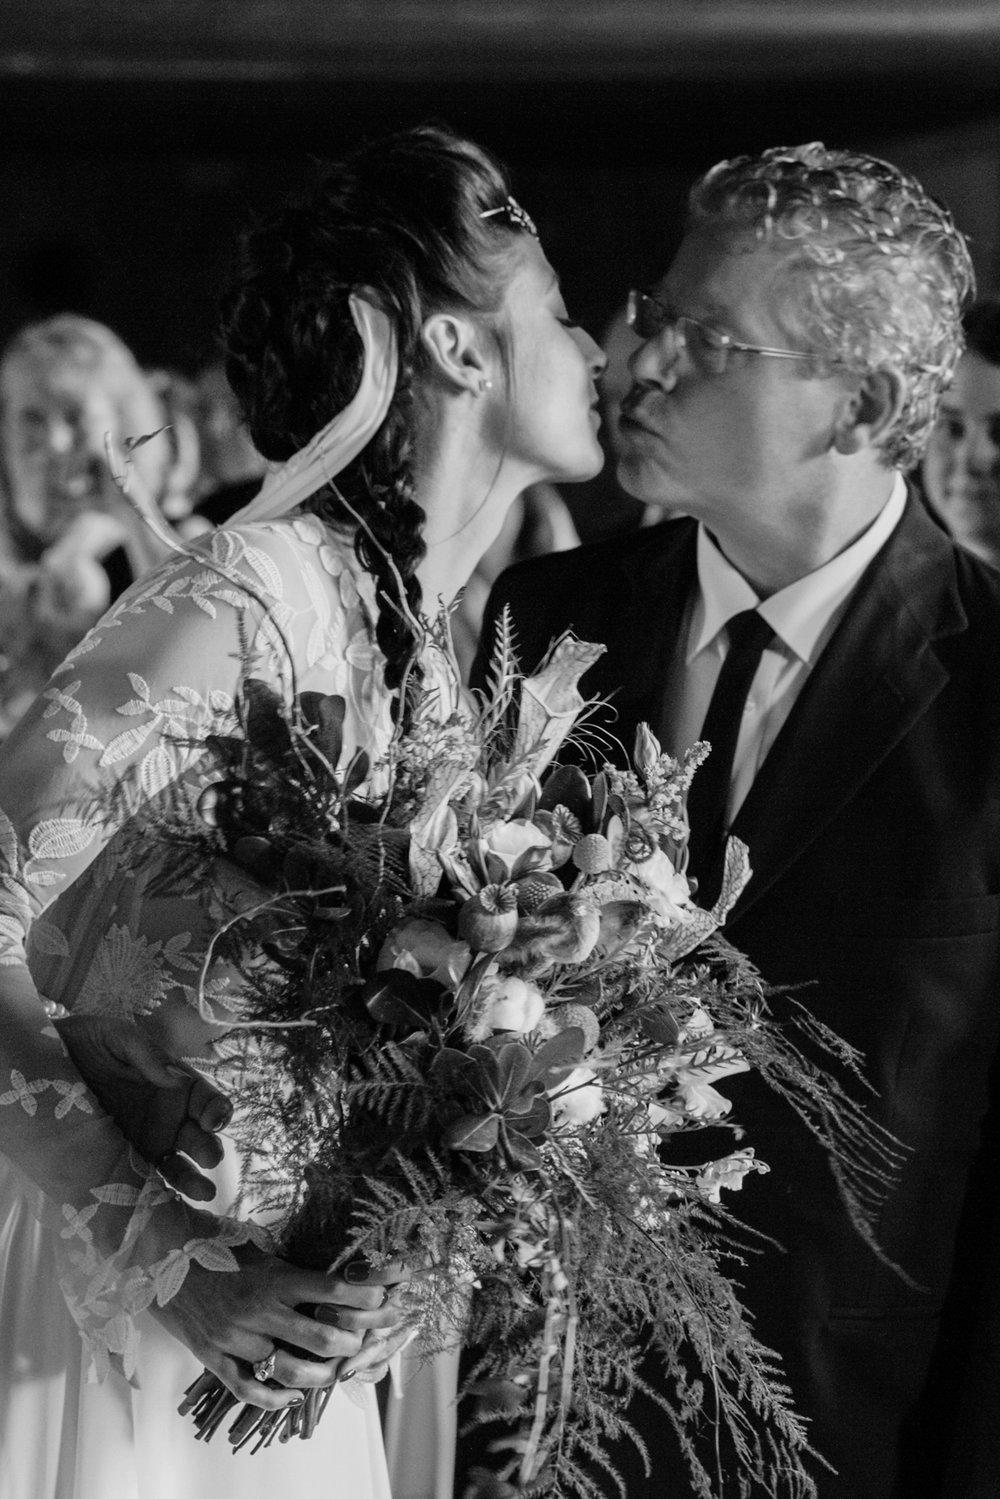 Kimberly-Coccagnia-Wedding-Photographer-78.JPG